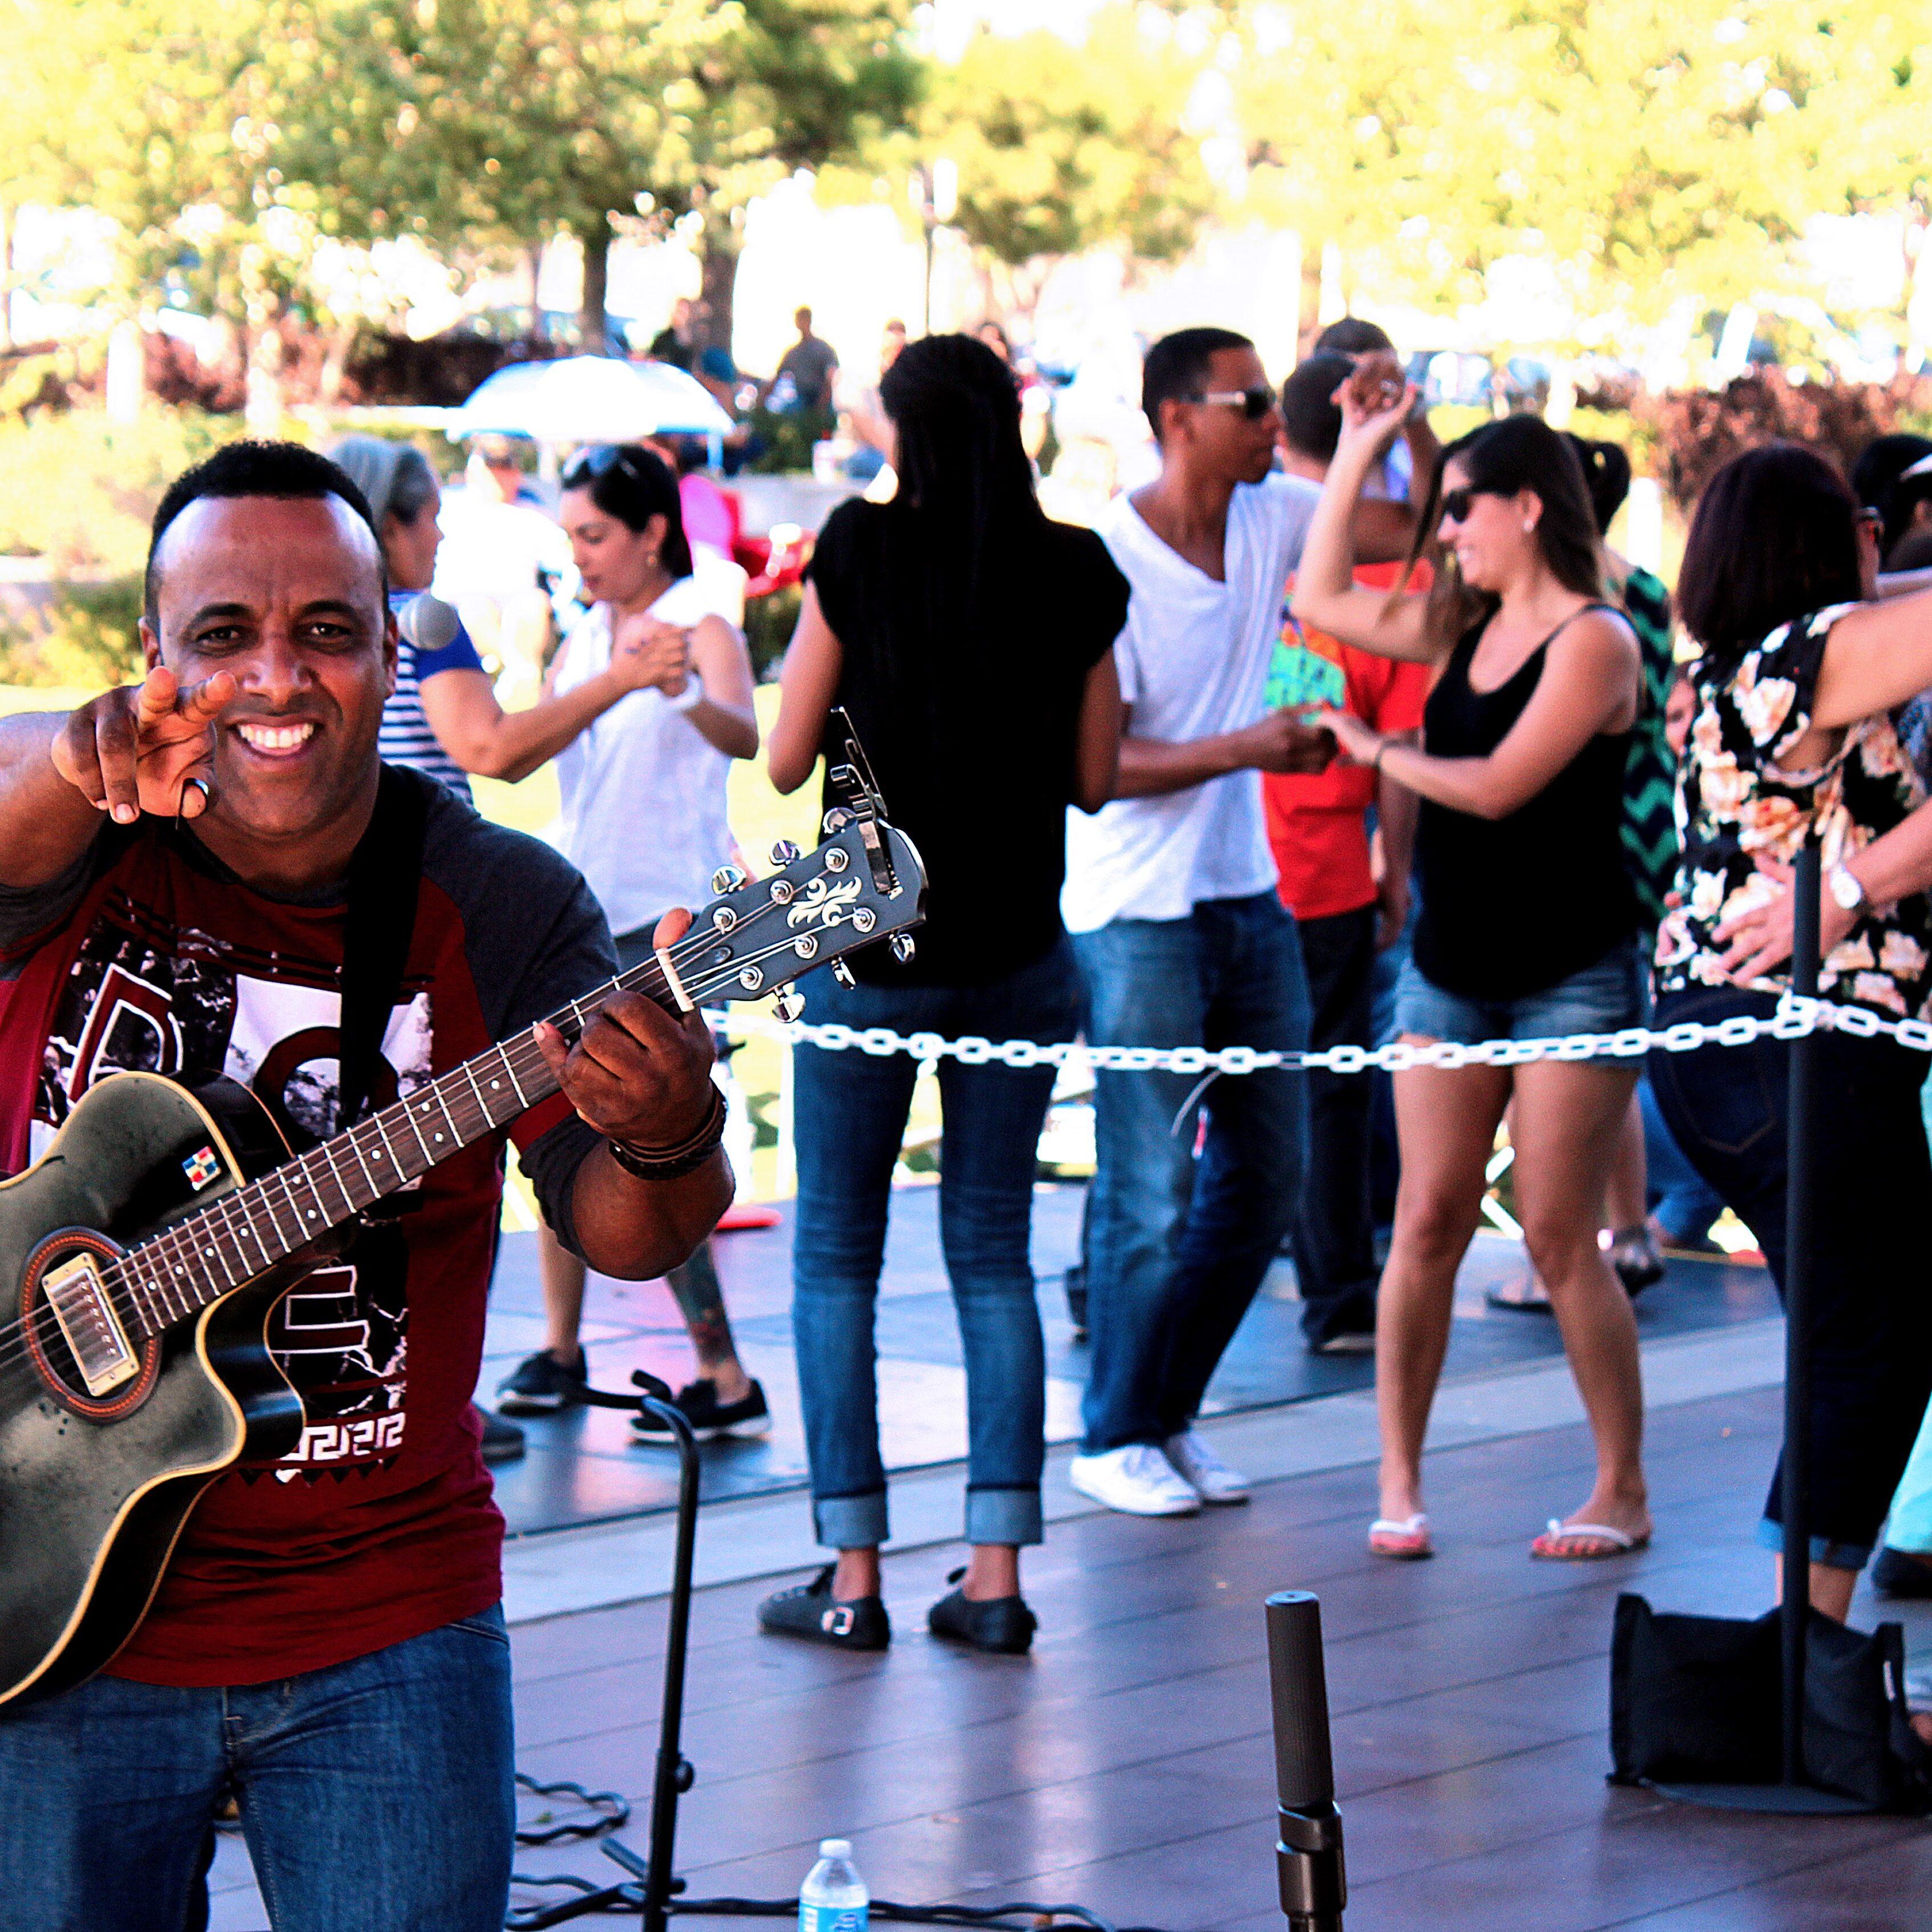 Joan Soriano rhythm guitar player Nicolas Frias